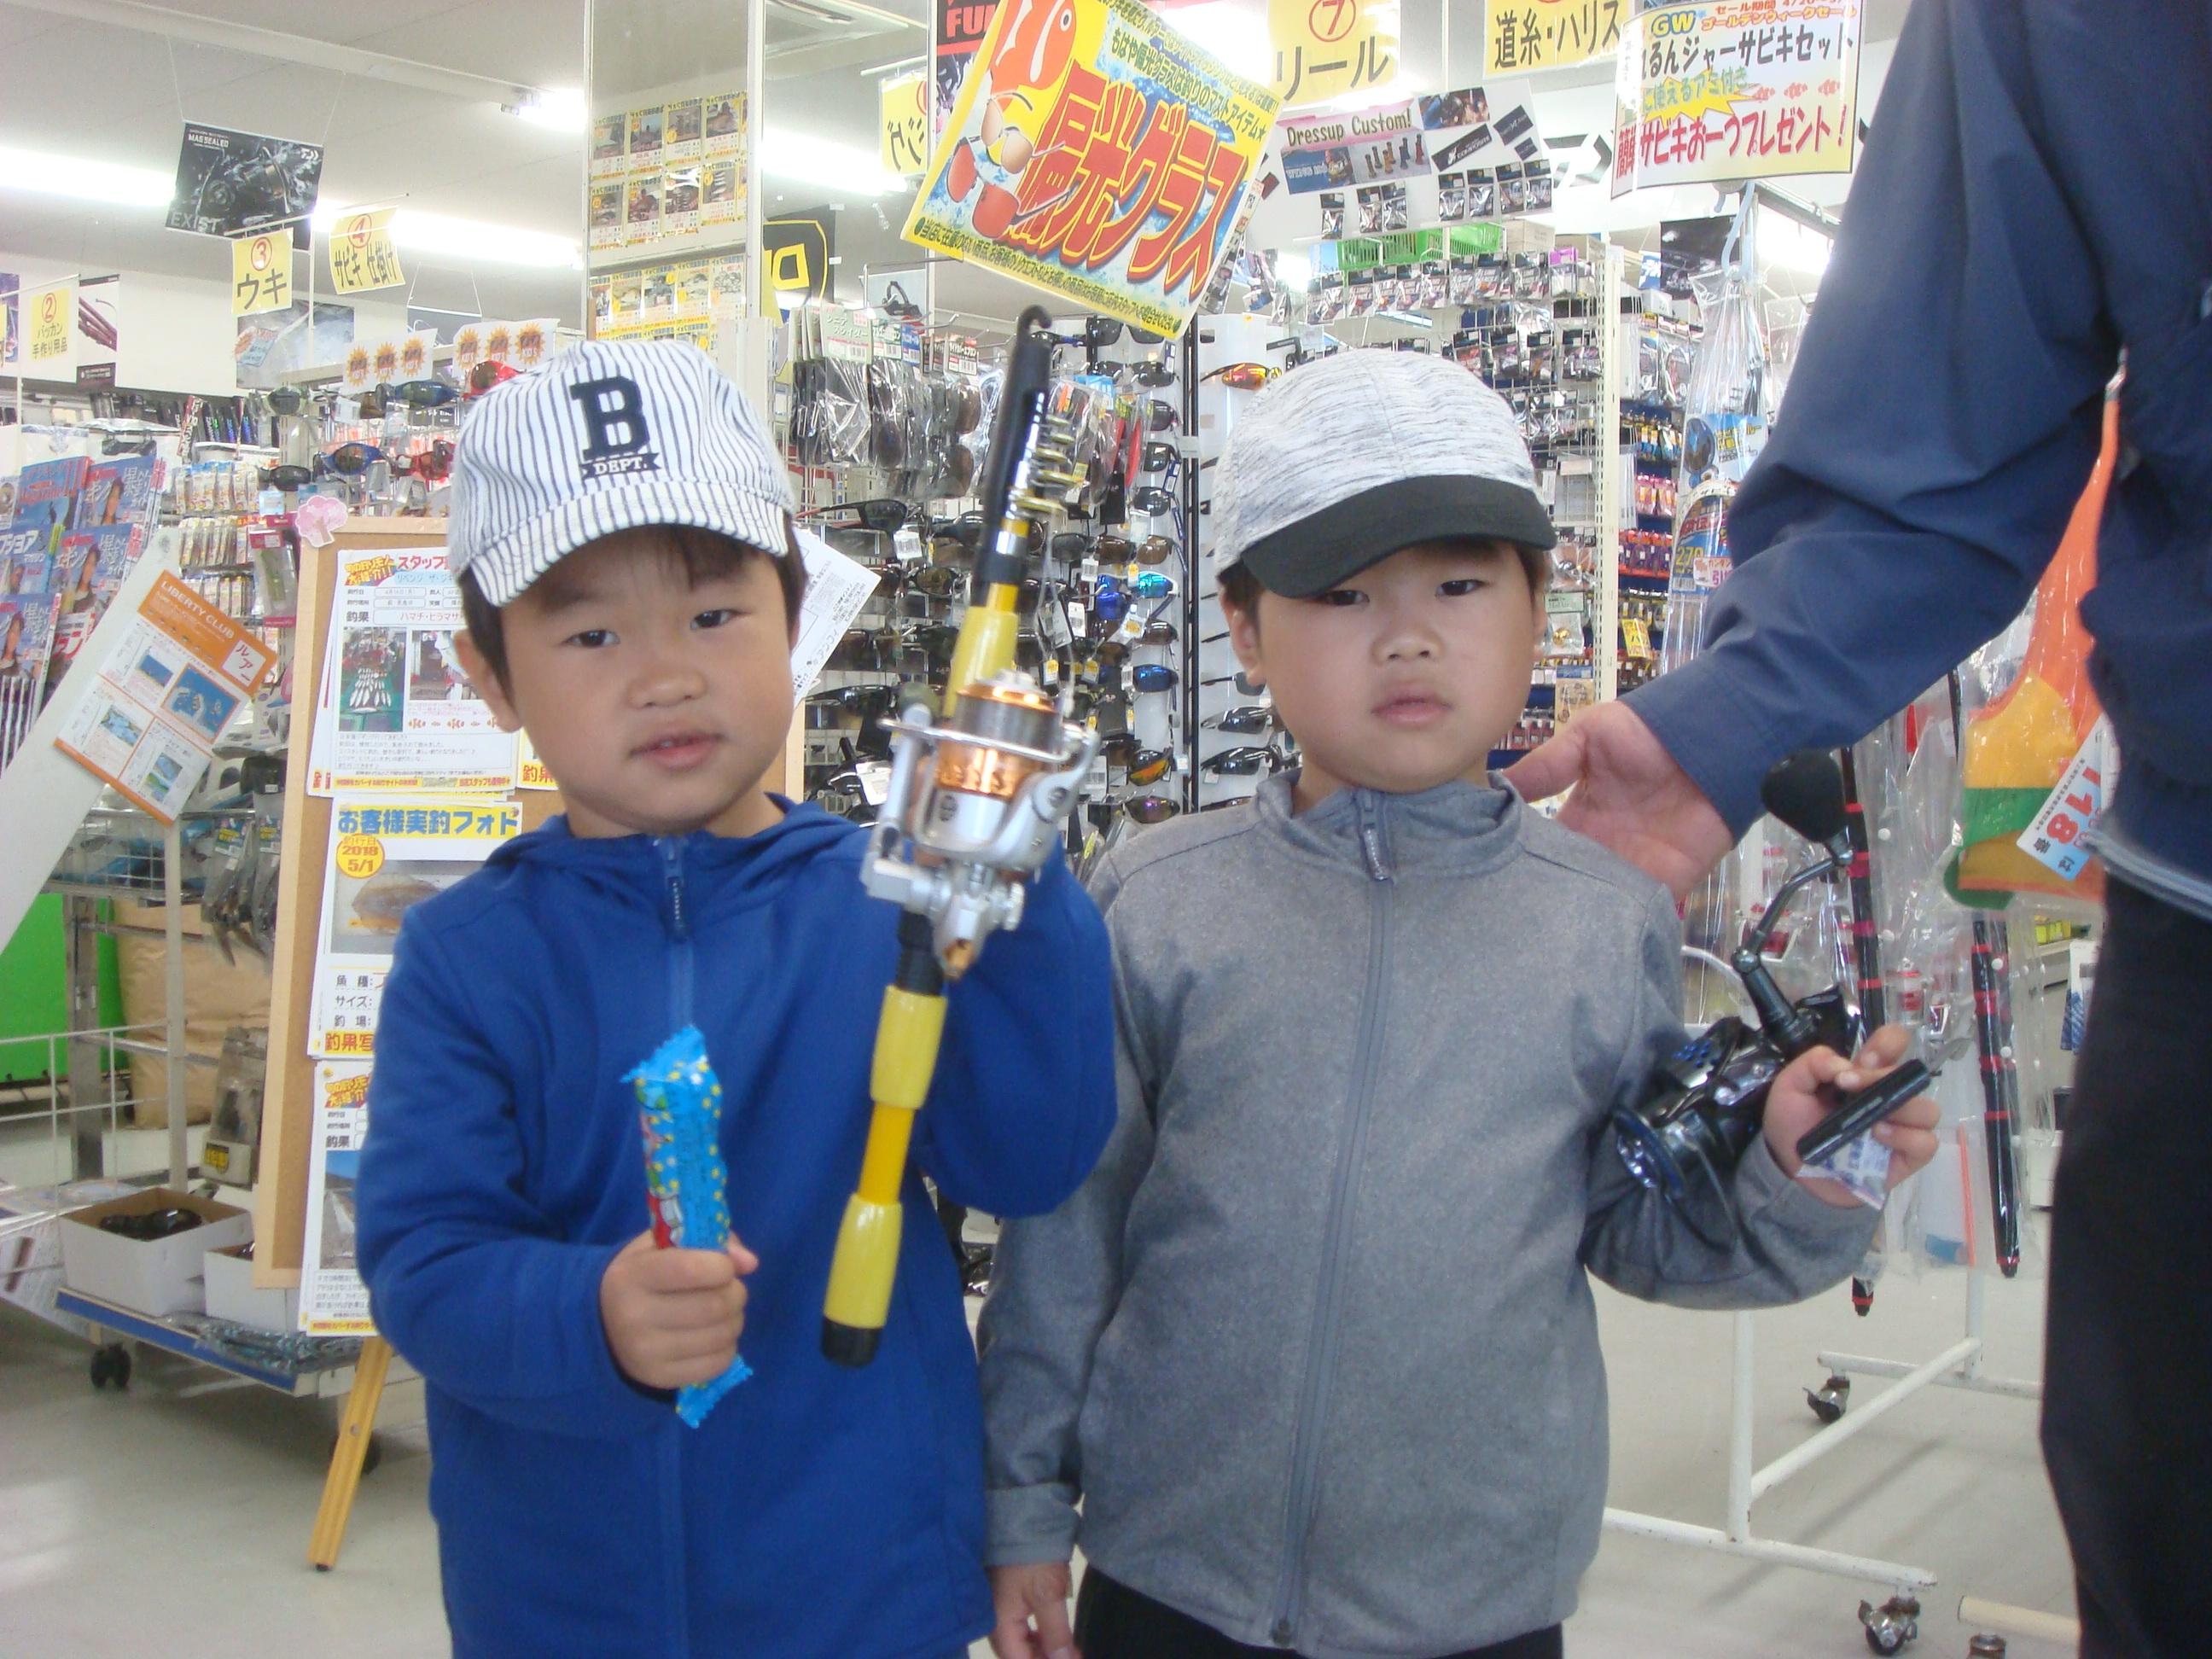 http://www.e-angle.co.jp/shop/news/DSC02985.JPG